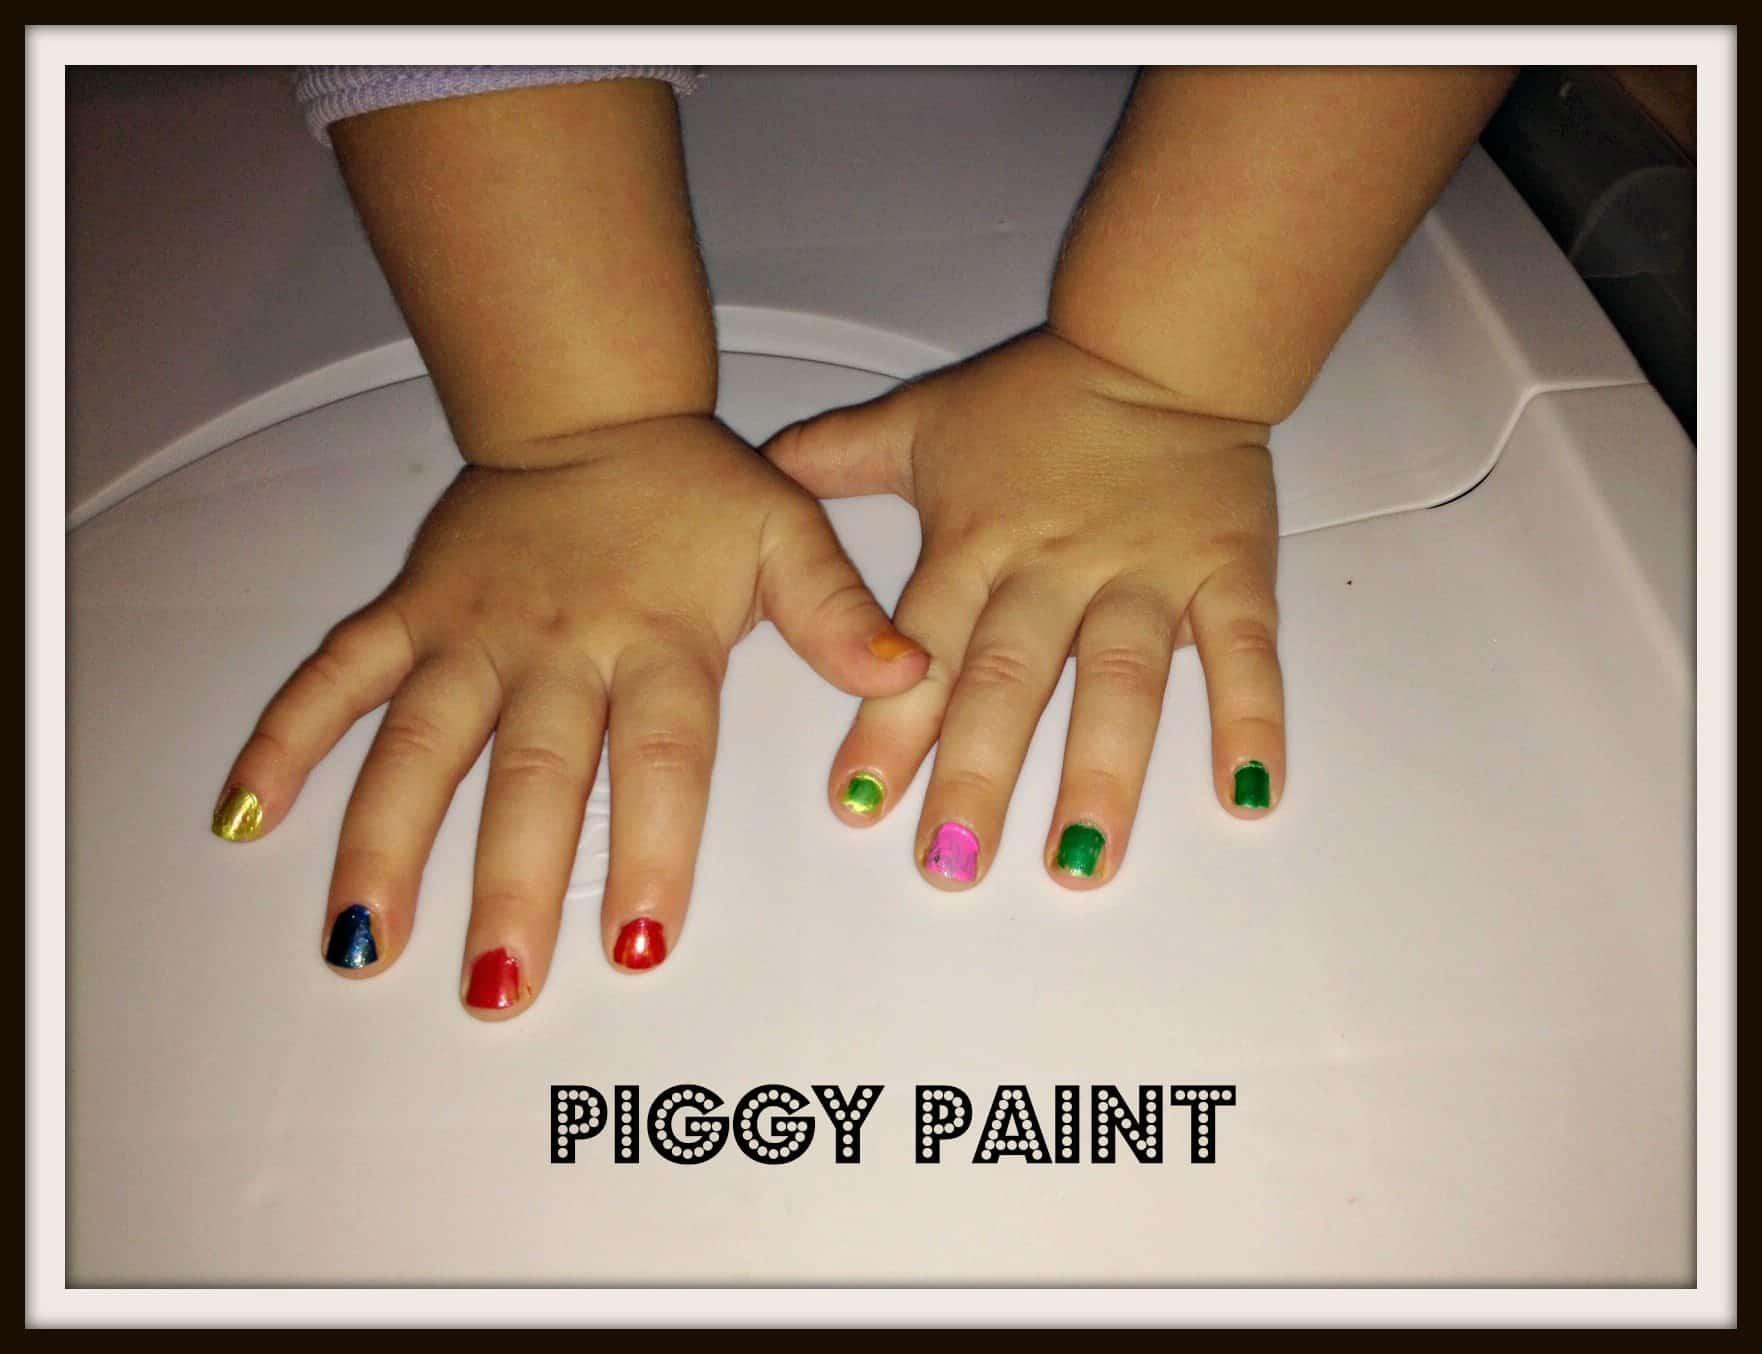 Piggy Paint - Safe Nail Polish For Kids + 15% Off Code - Saving You ...